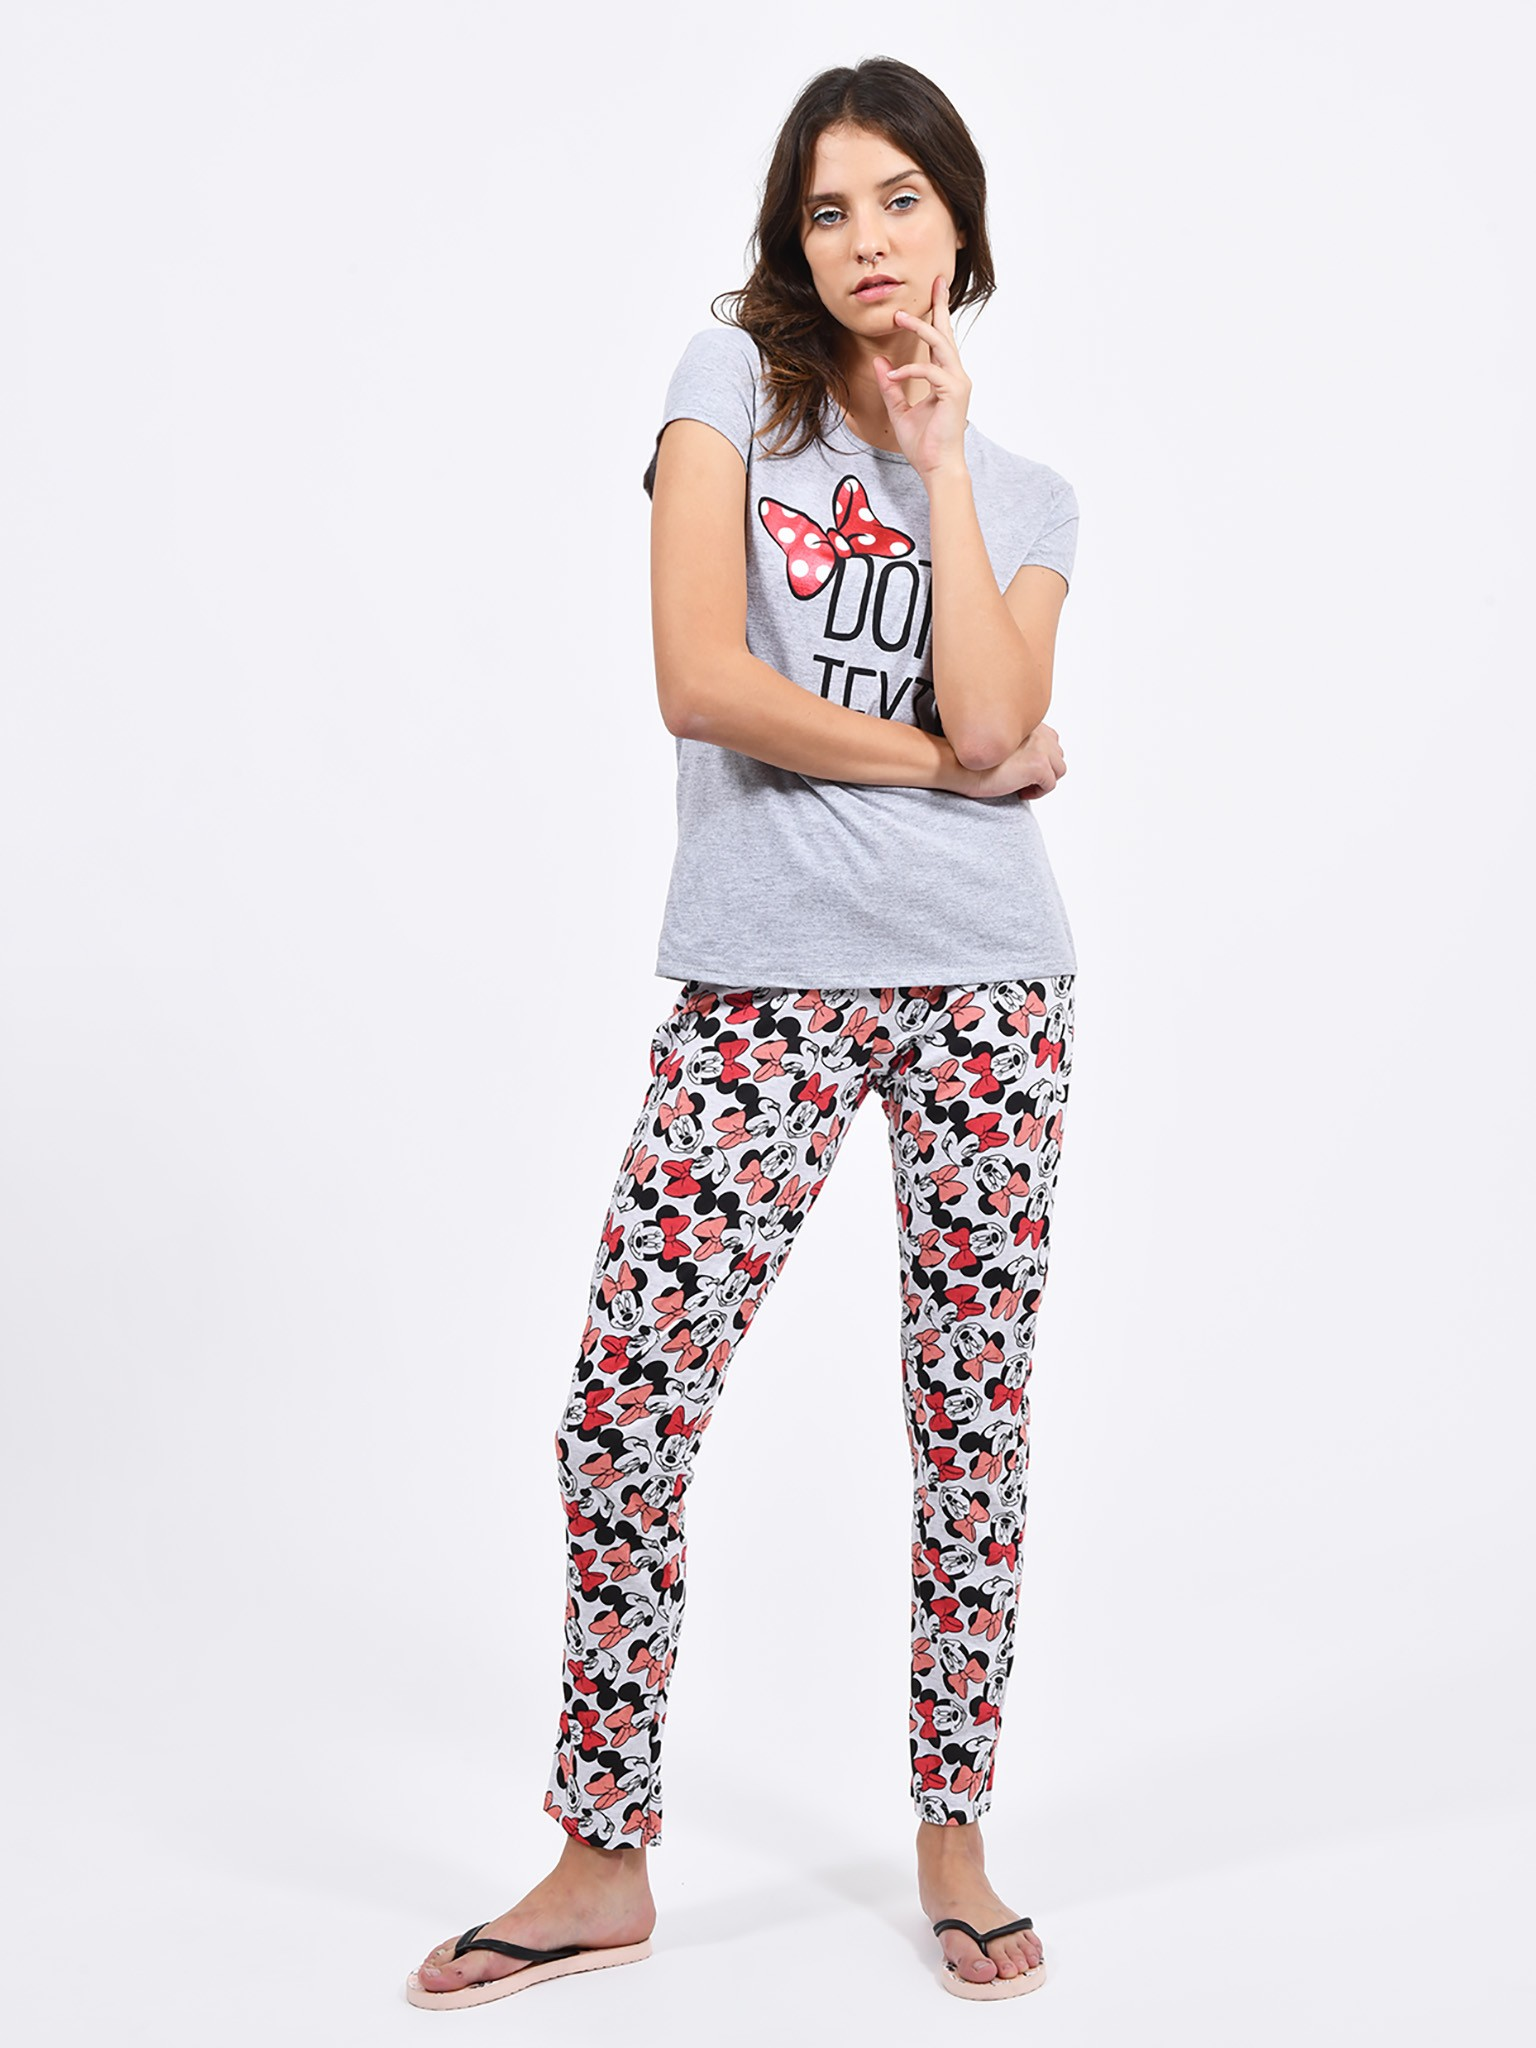 Oferta de Pijama Minnie Texto por $56.7